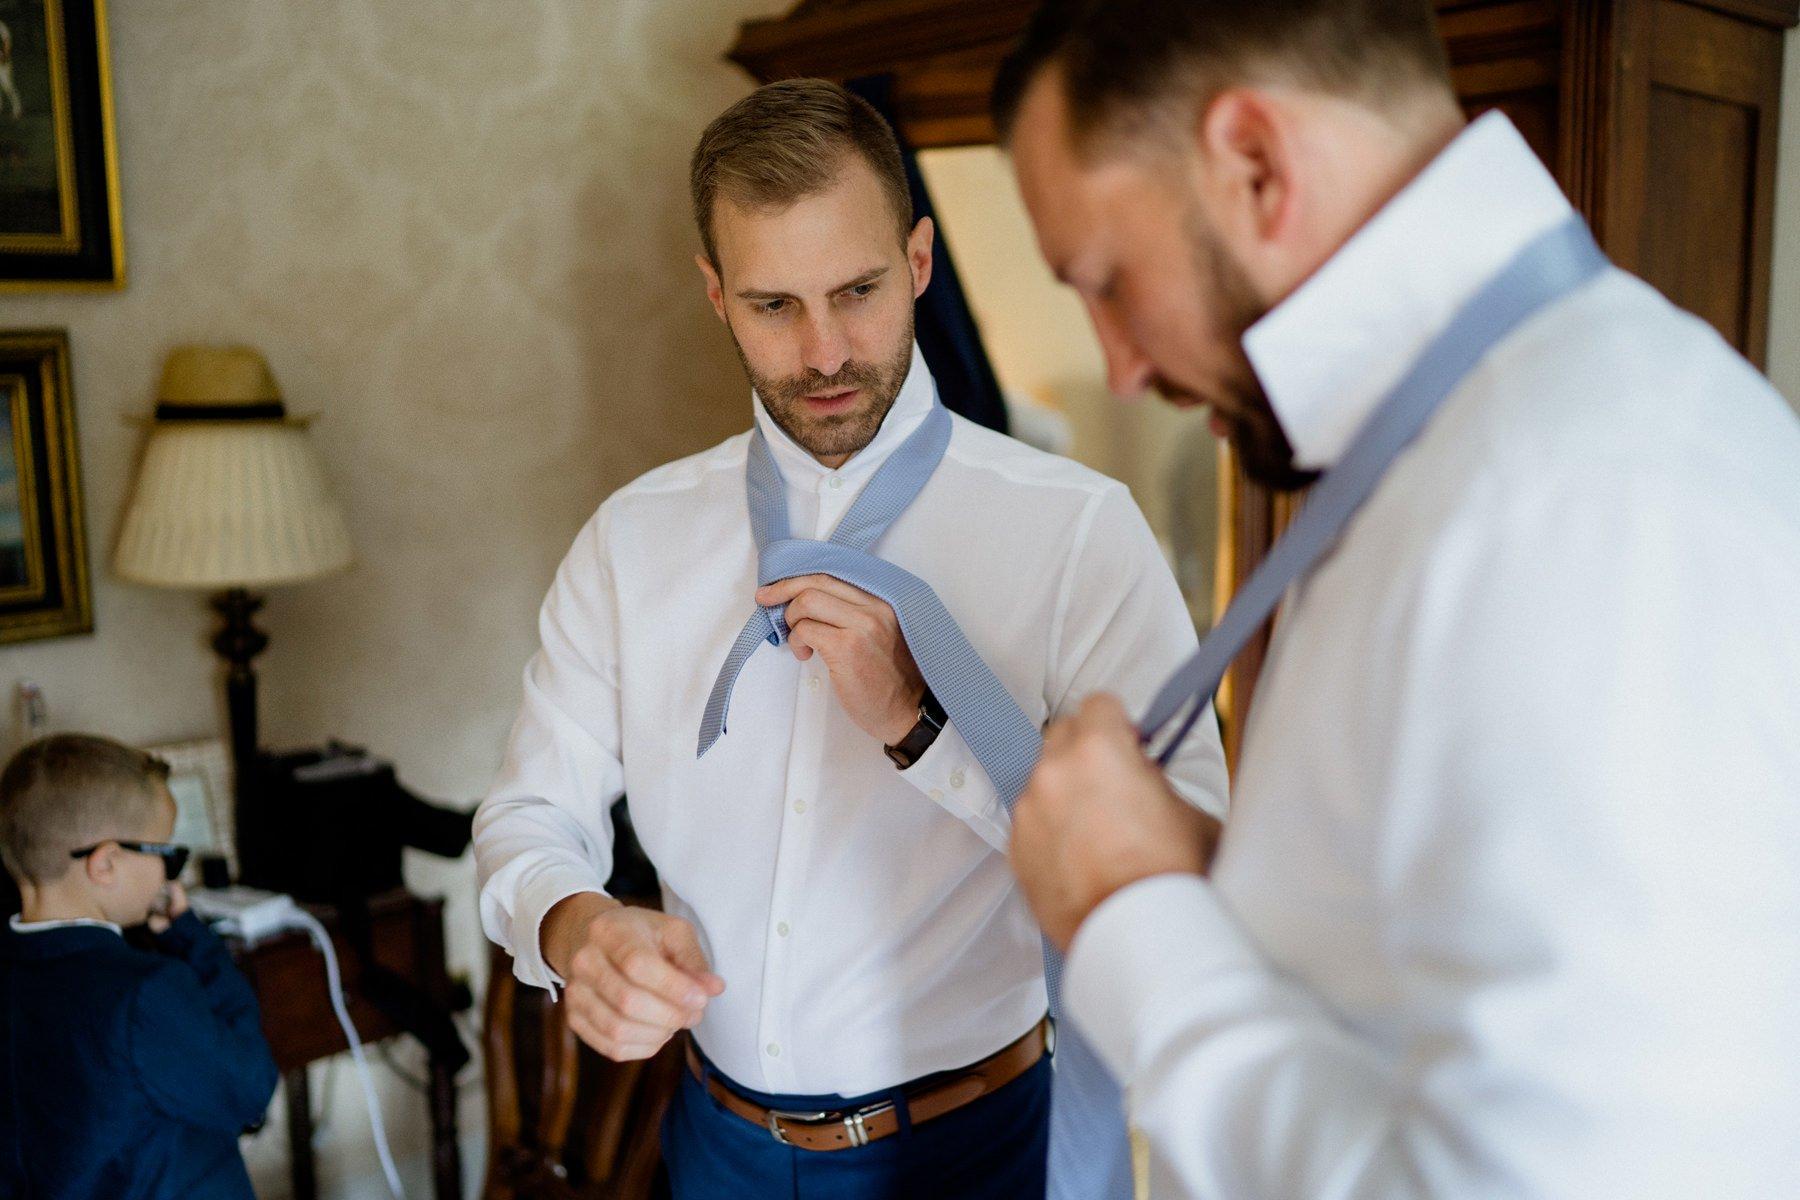 waterford-castle-wedding-groom-getting-ready